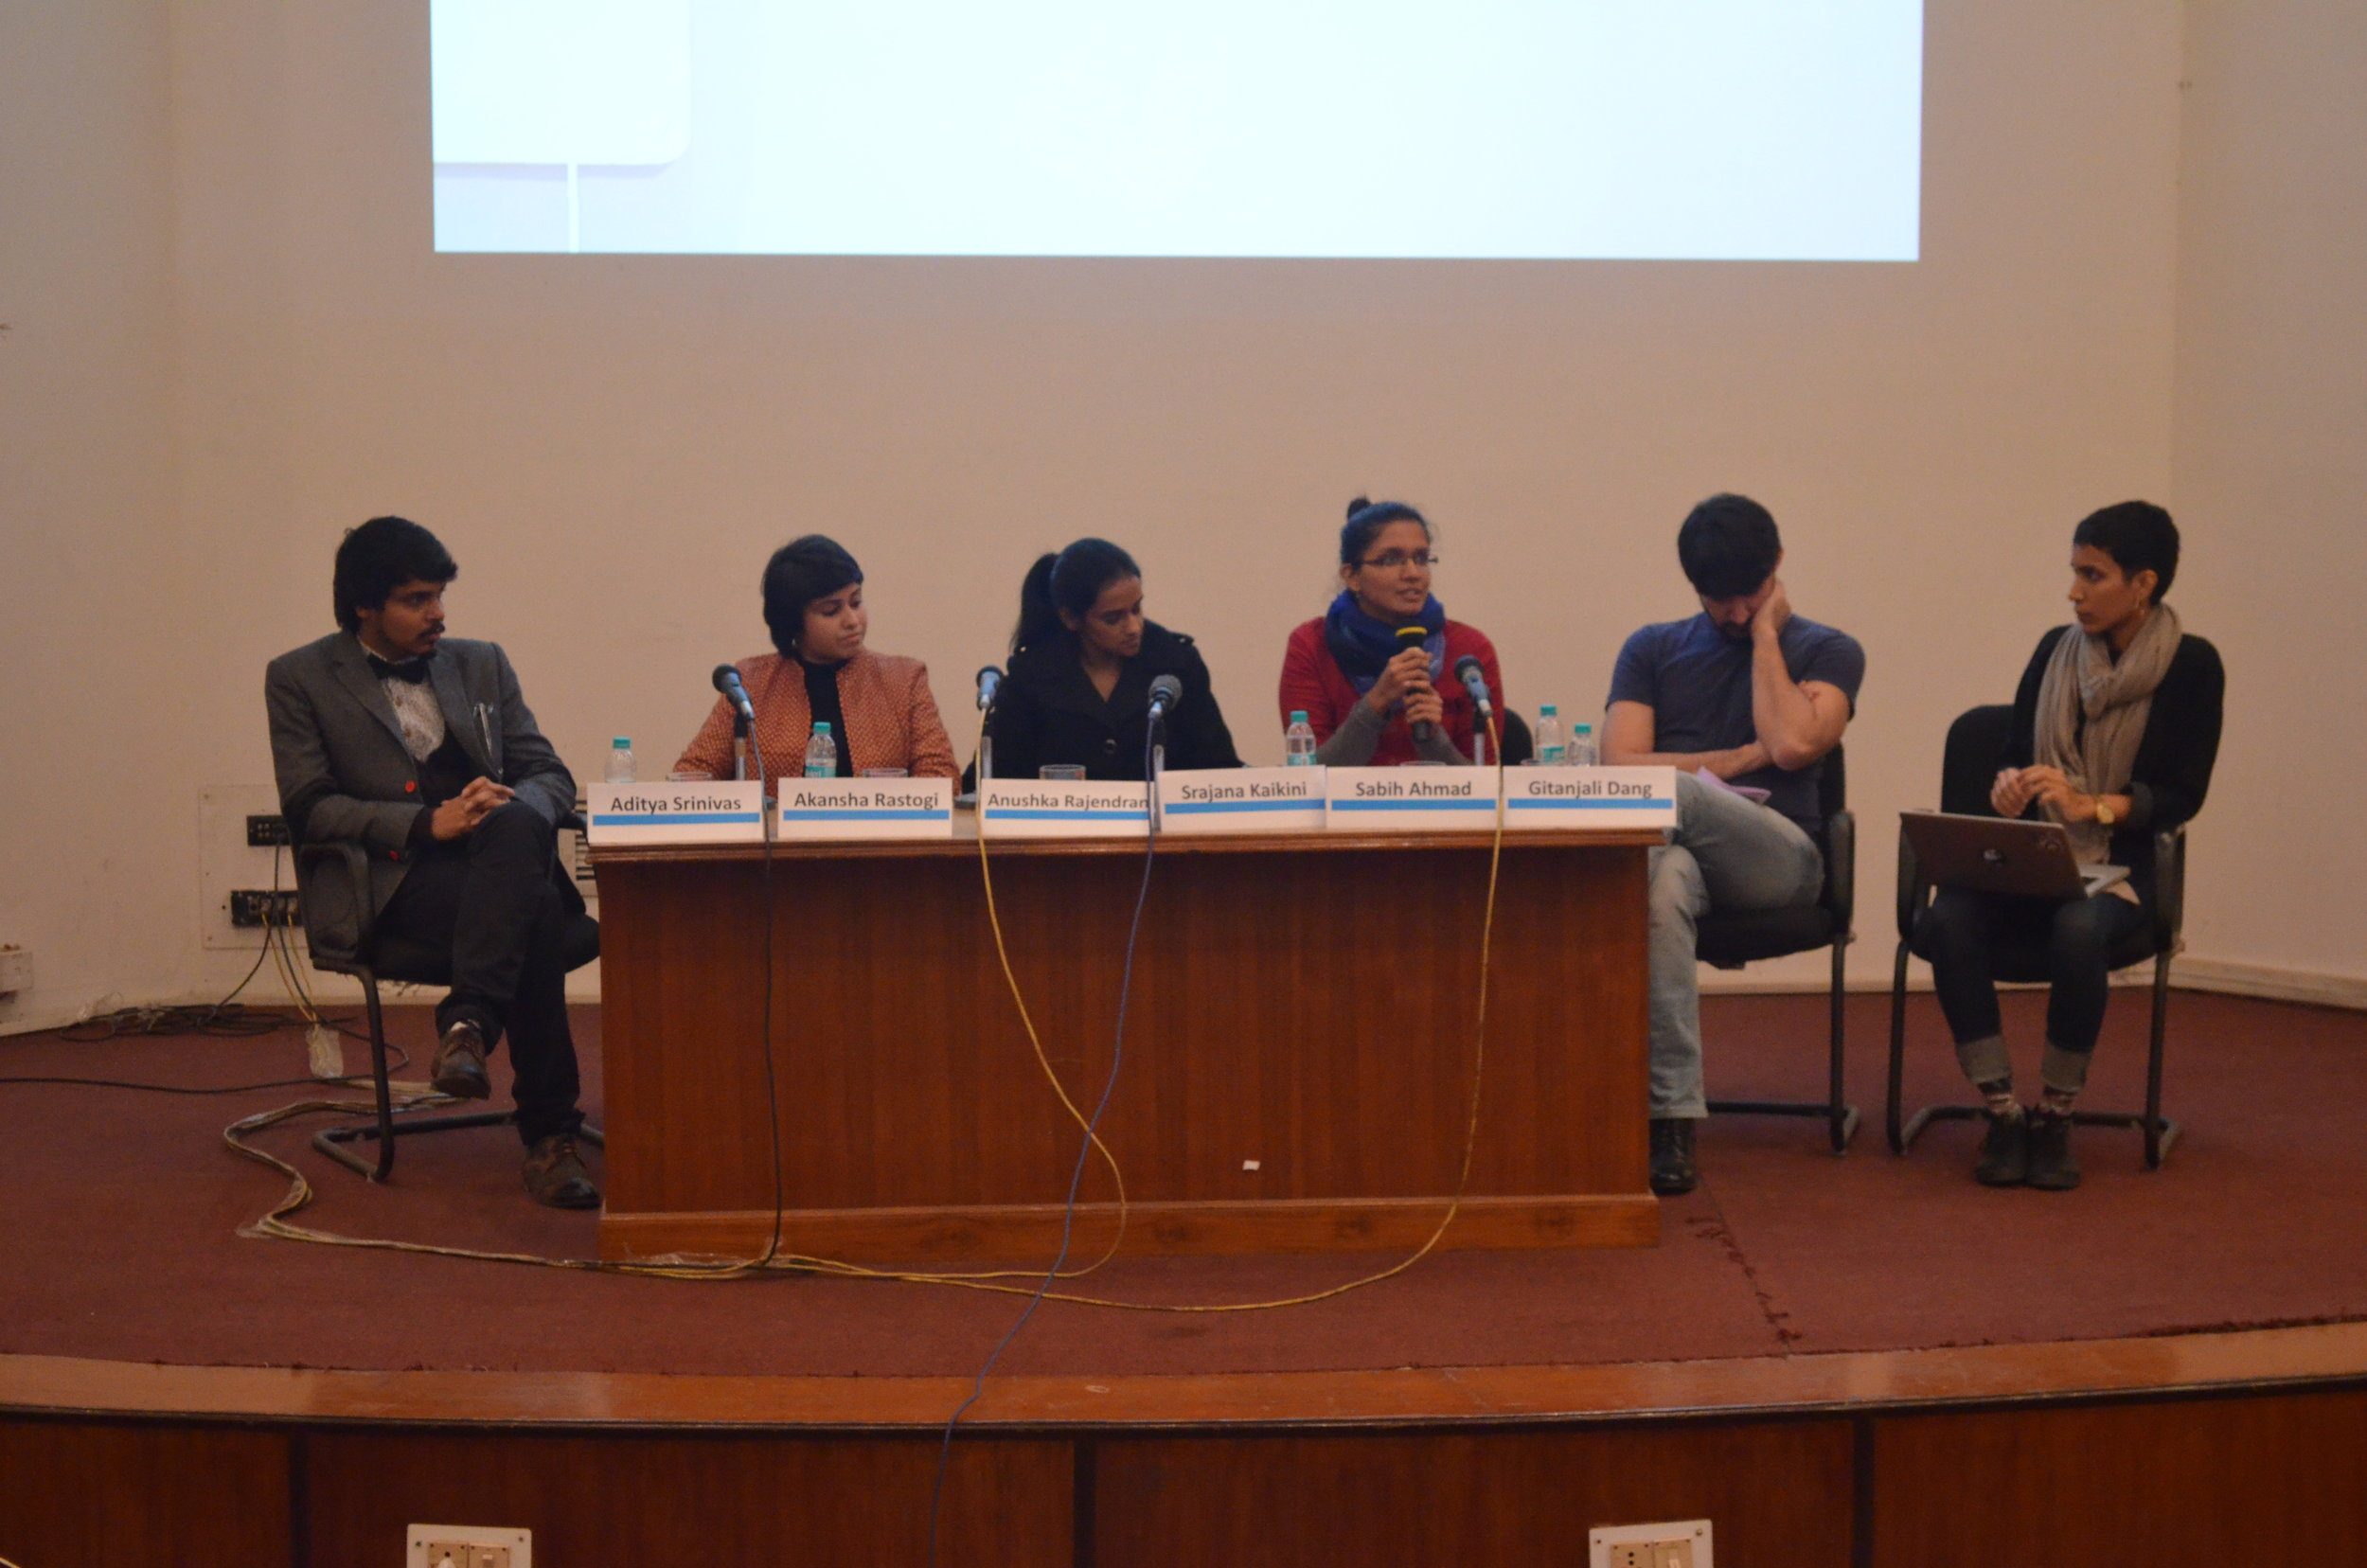 Young Curator's Forum with Aditya Srinivas, Sabih Ahmad, Anushka Rajendran, Srajana Kaikini, Akansha Rastogi and Gitanjali Dang.